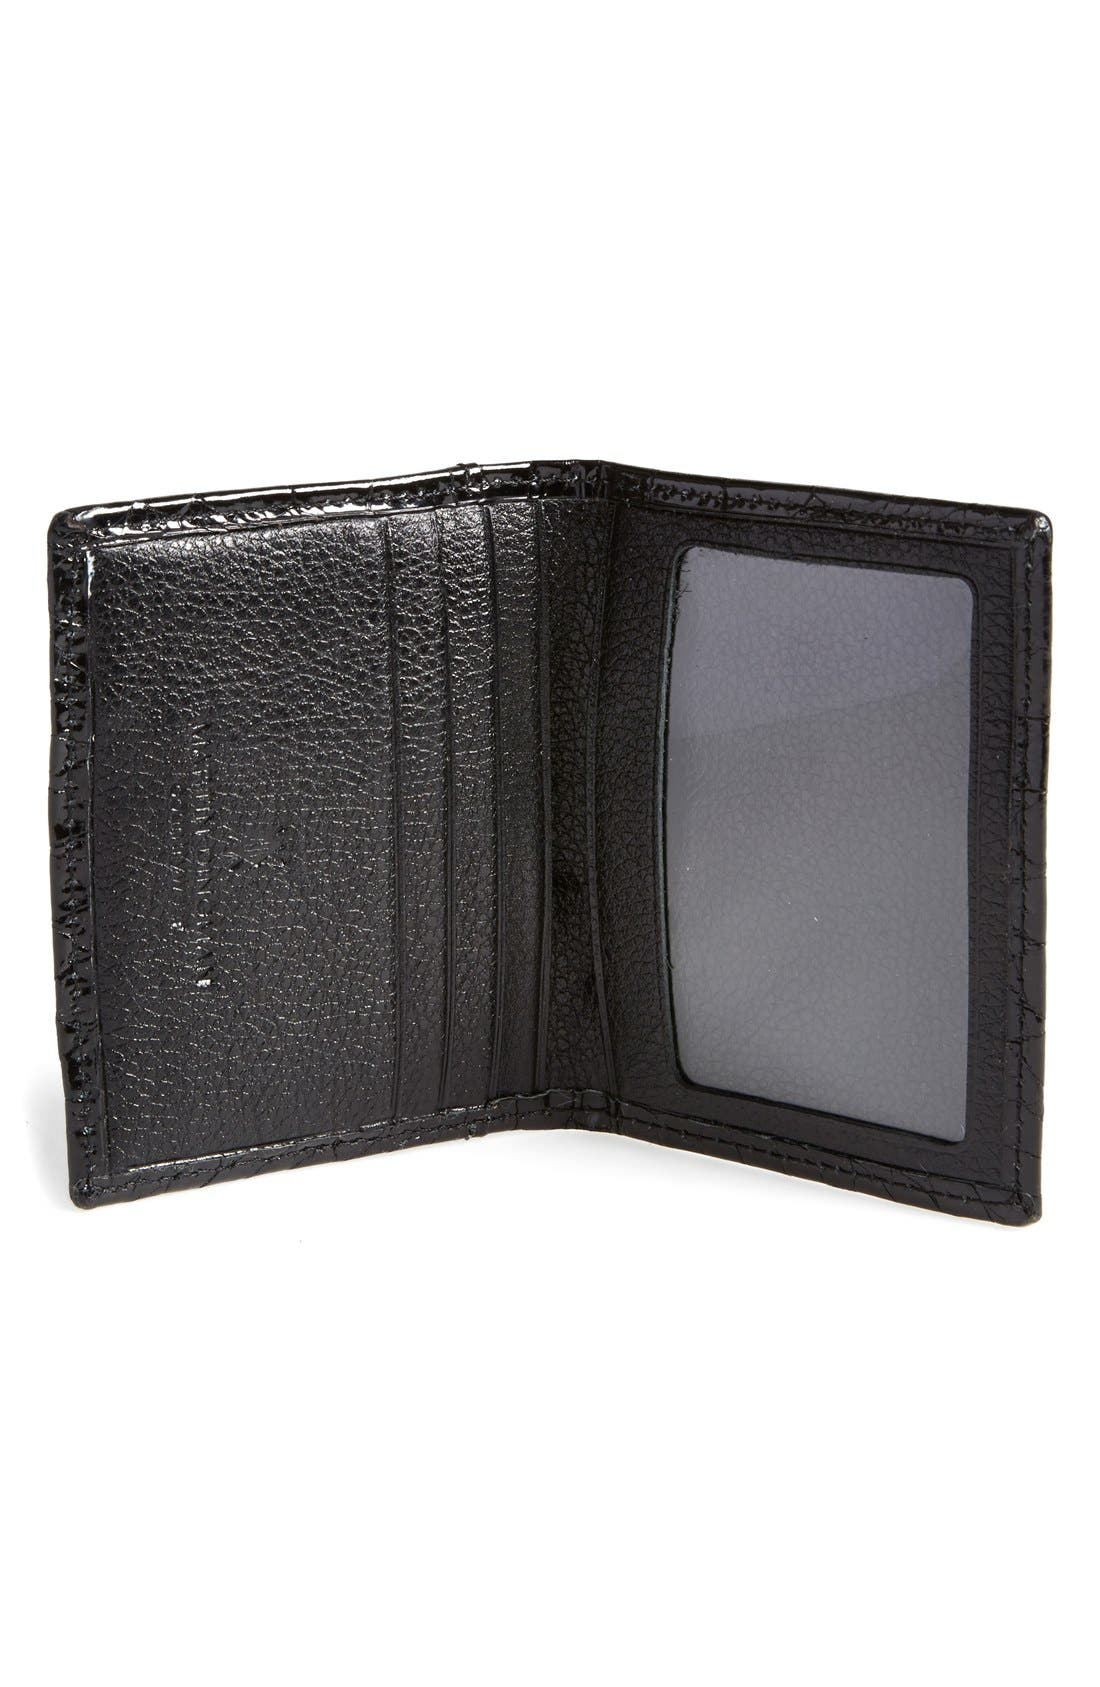 'Joseph' Genuine American Alligator Leather ID Wallet,                             Alternate thumbnail 2, color,                             001